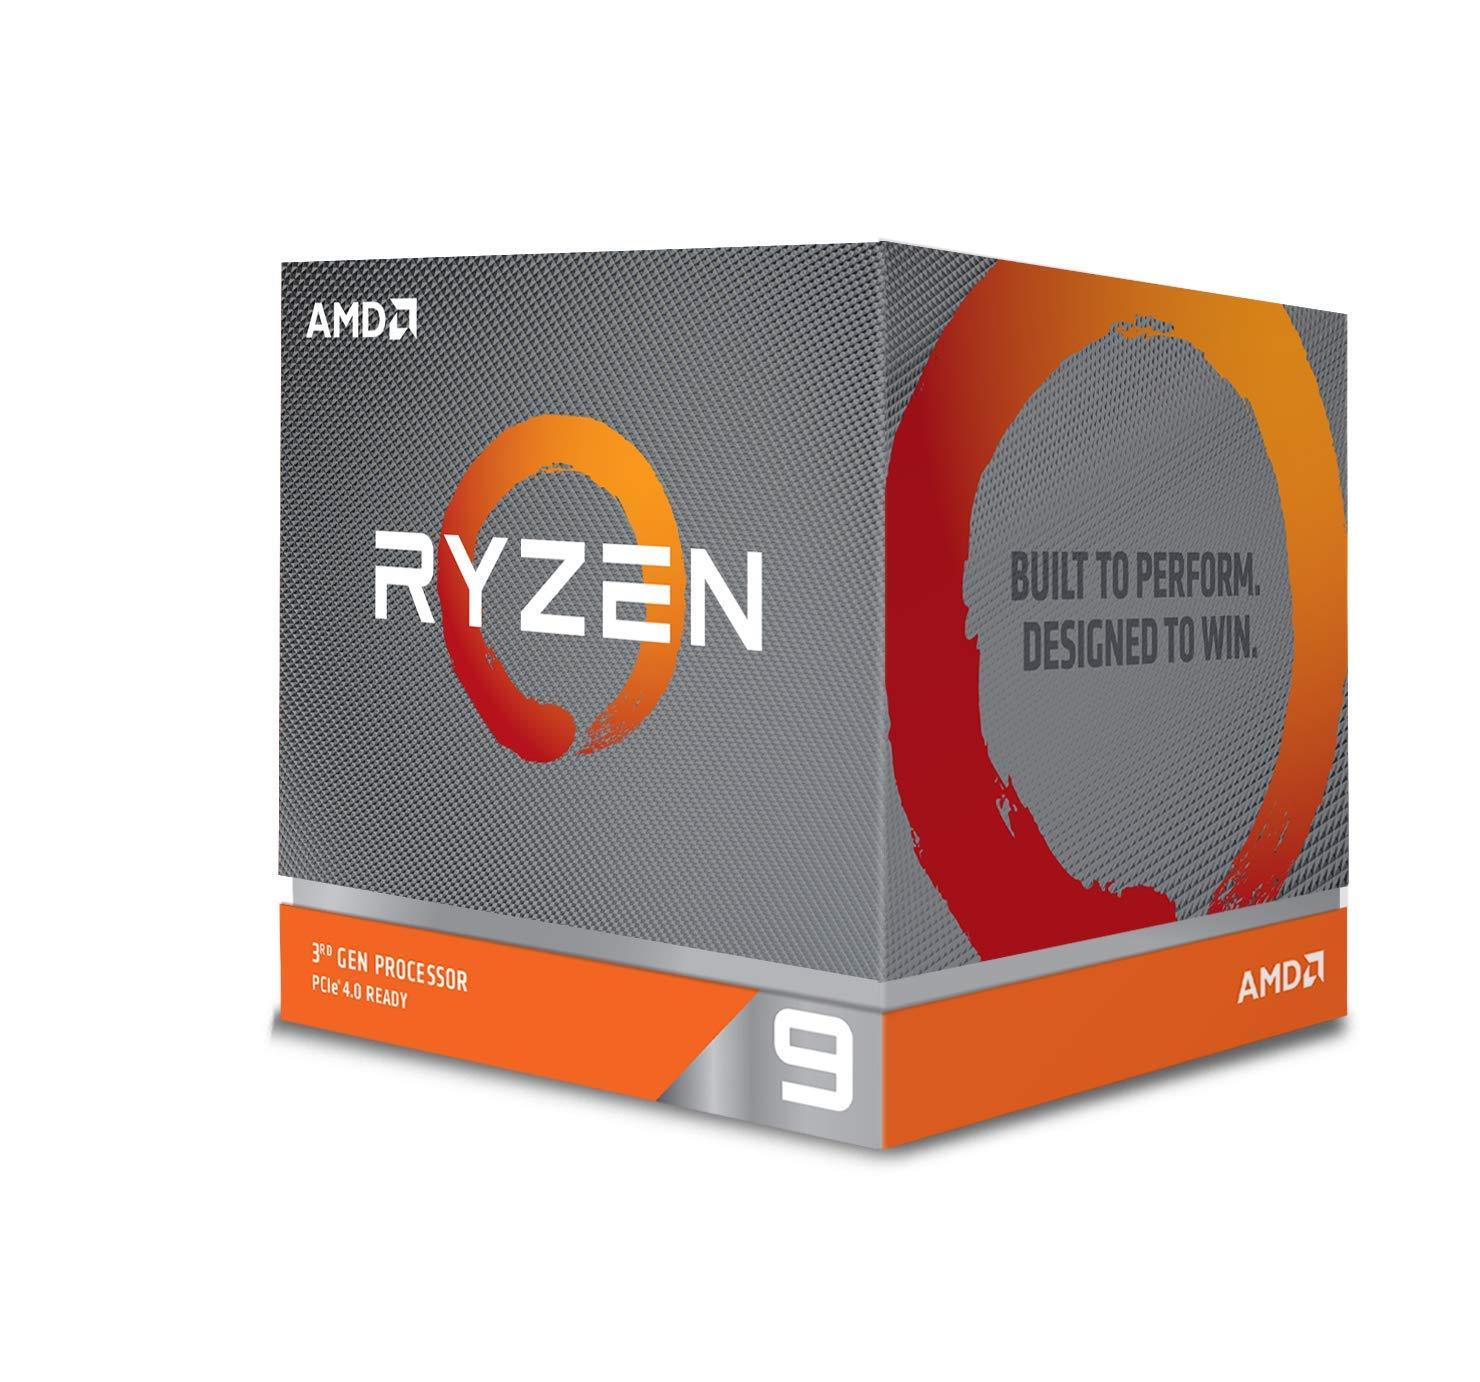 AMD Ryzen 9 3900X 12-core, 24-Thread Unlocked Desktop Processor with Wraith Prism LED Cooler [Processor] $493.84